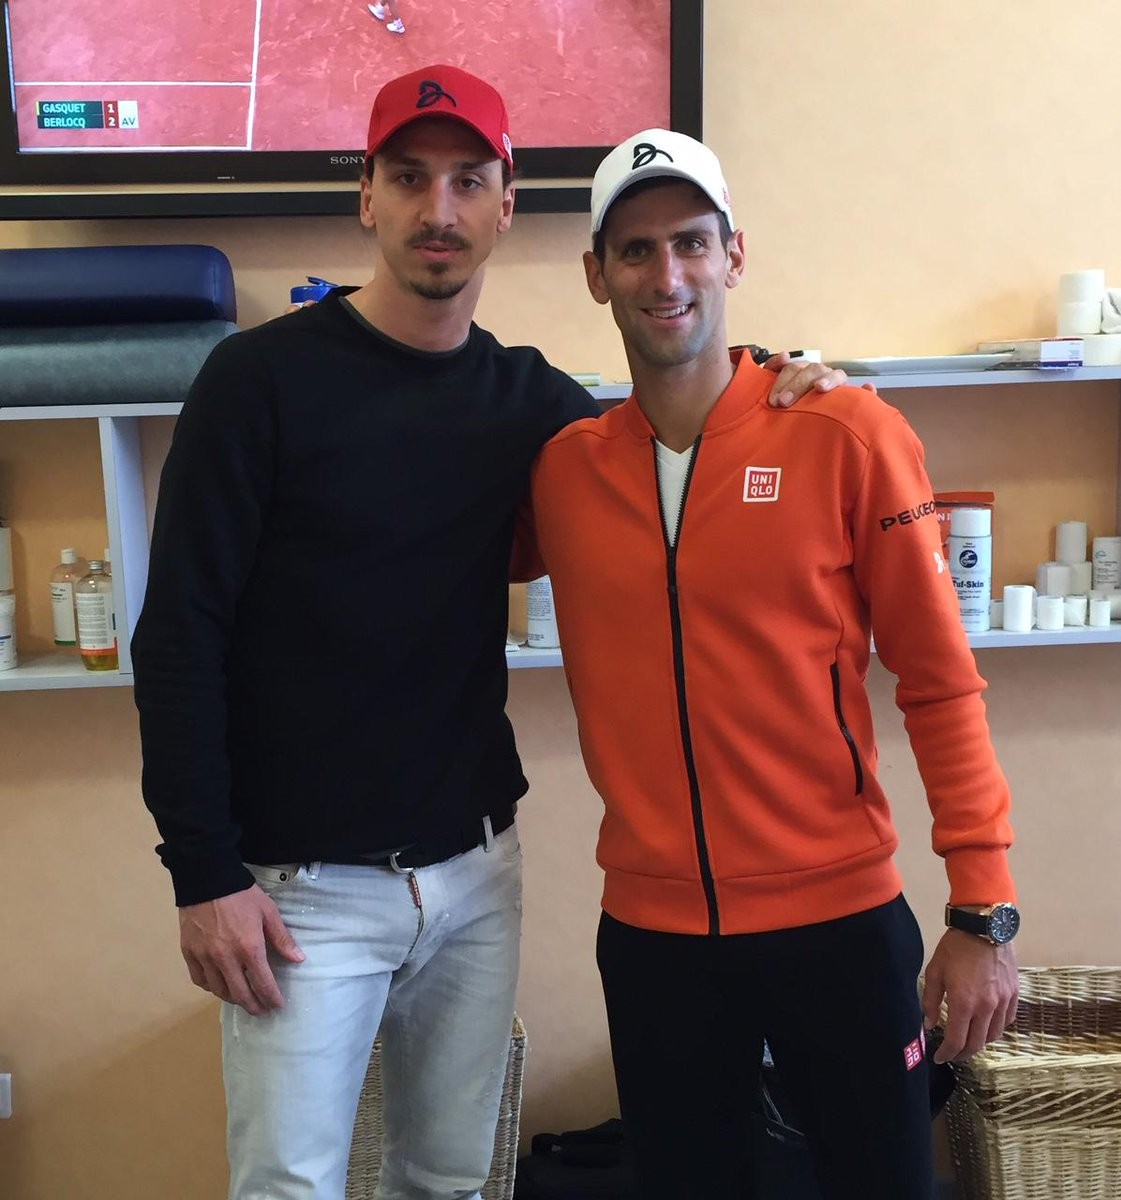 ¿Cuánto mide Novak Djokovic? - Altura - Real height CJunou0VAAAaz6D